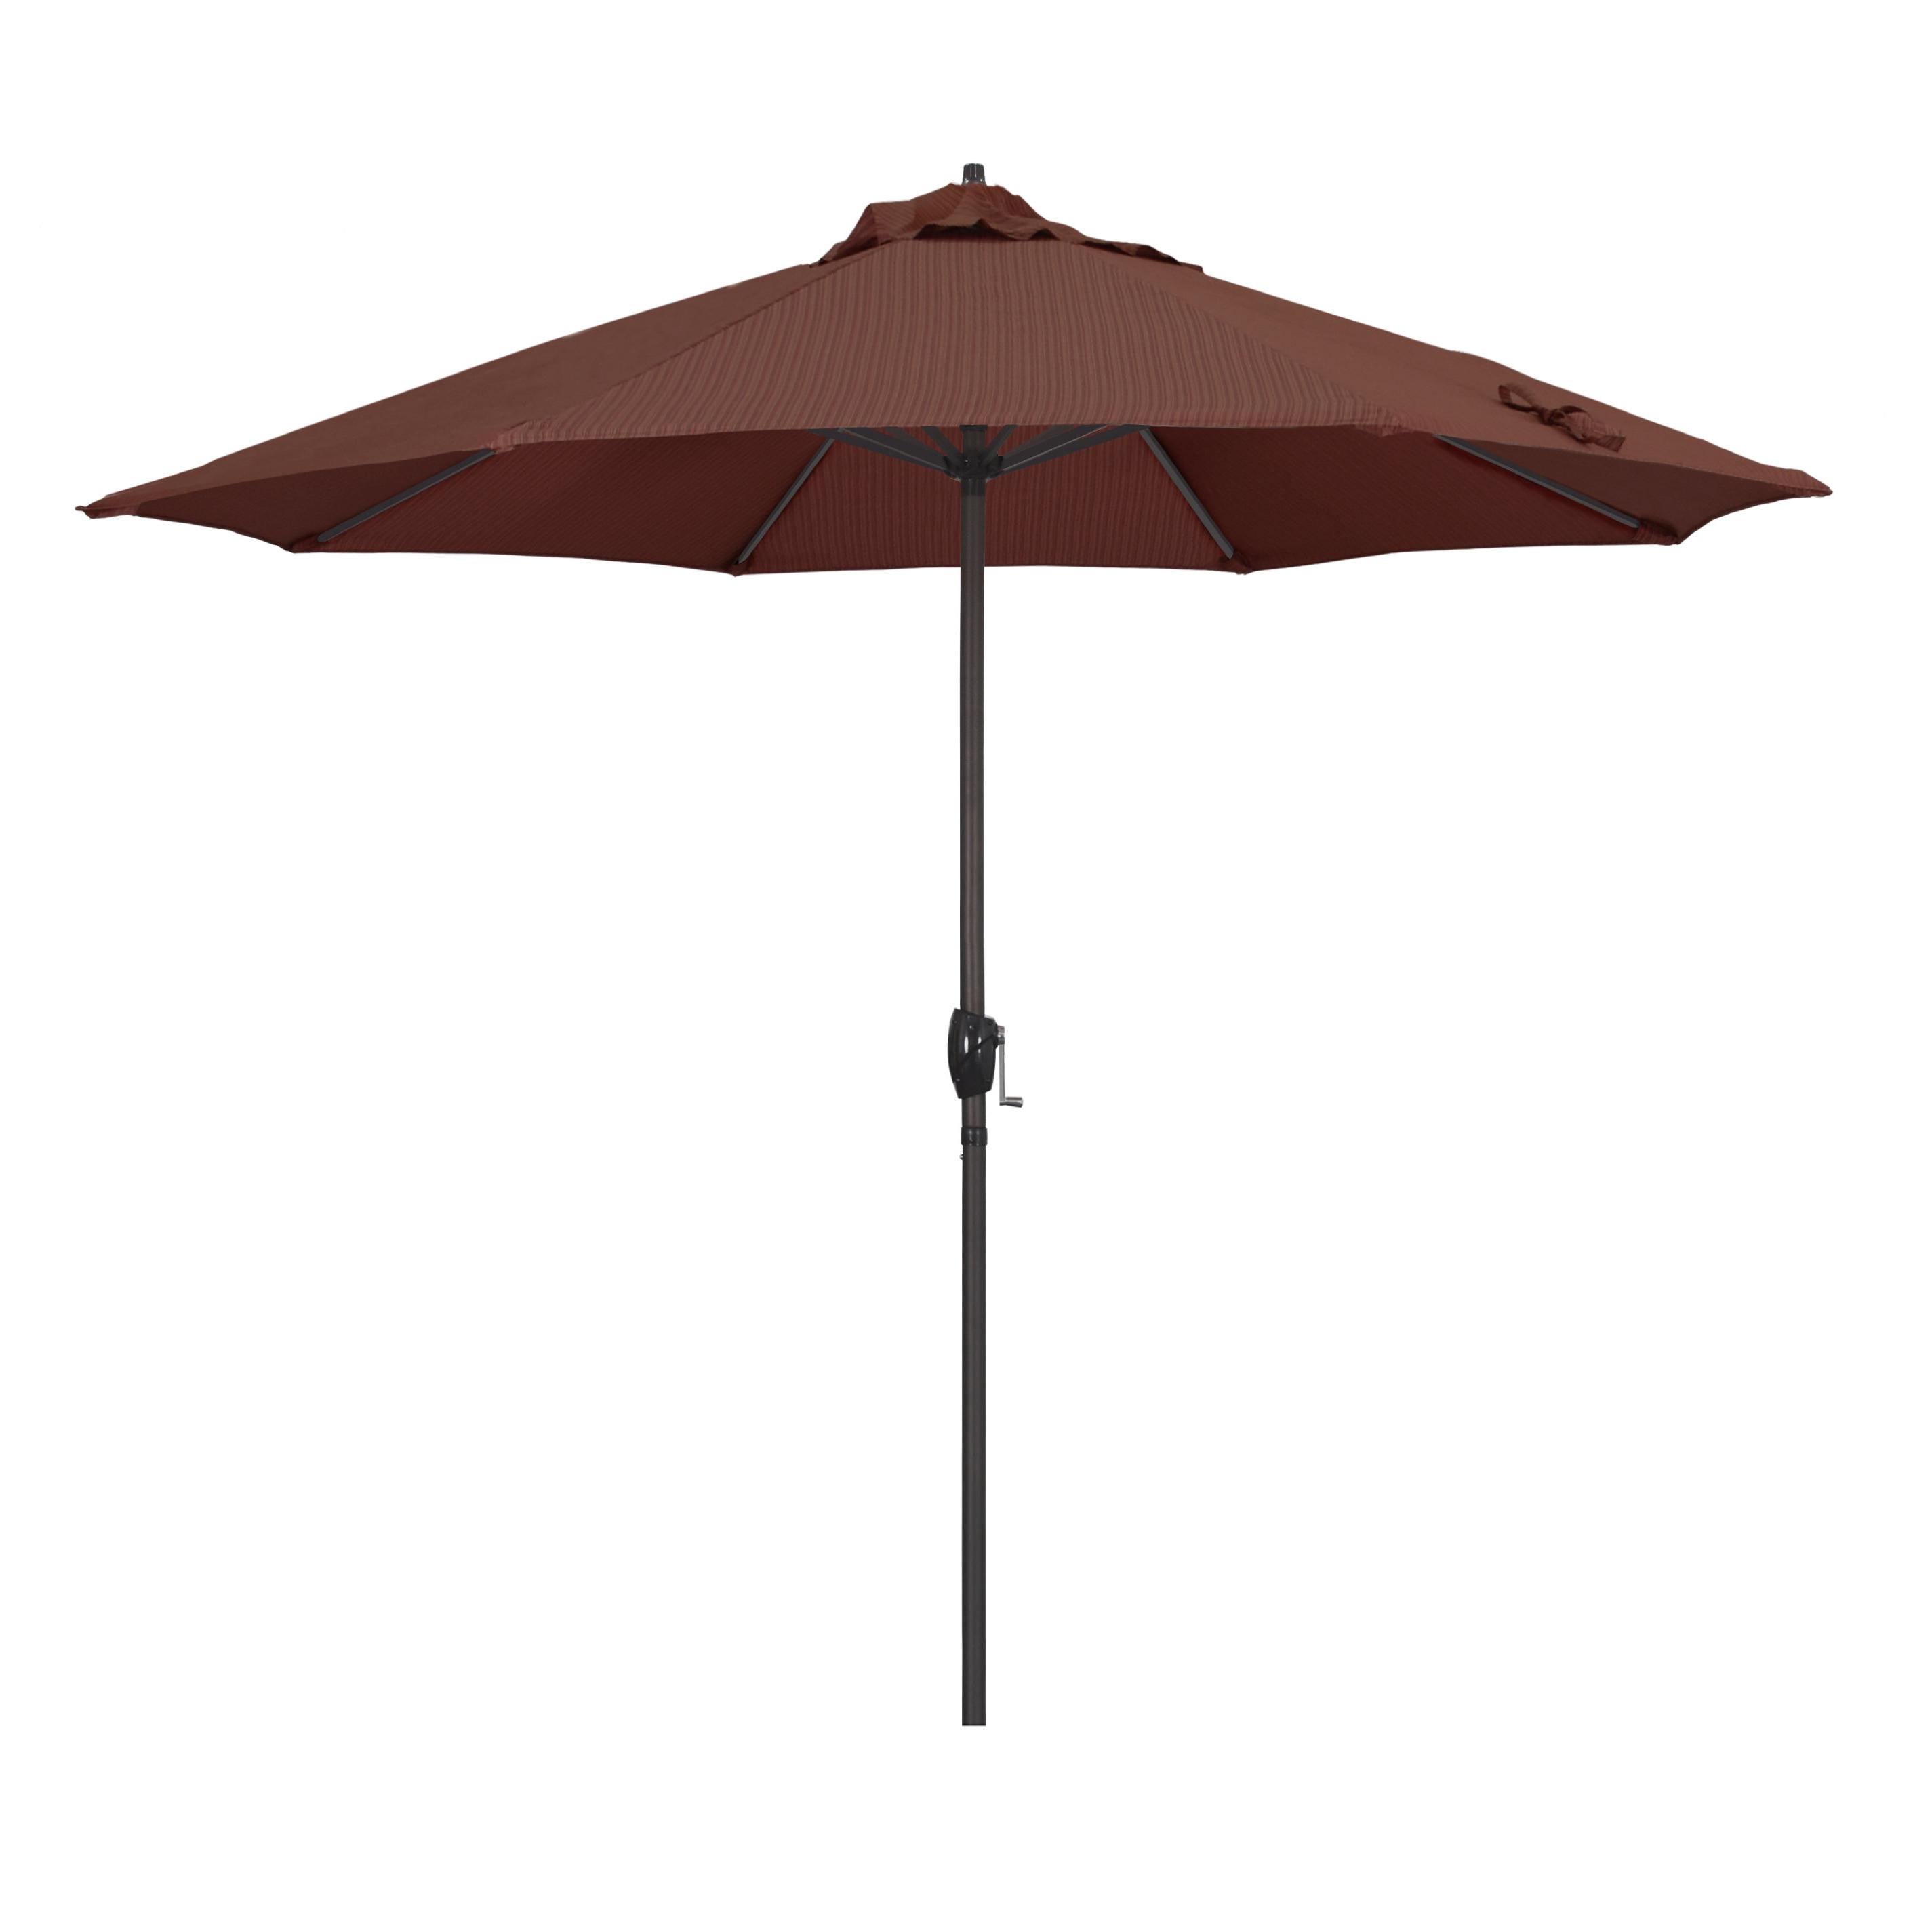 Caravelle Market Umbrellas Pertaining To Most Recent Cardine 9' Market Umbrella (View 8 of 20)